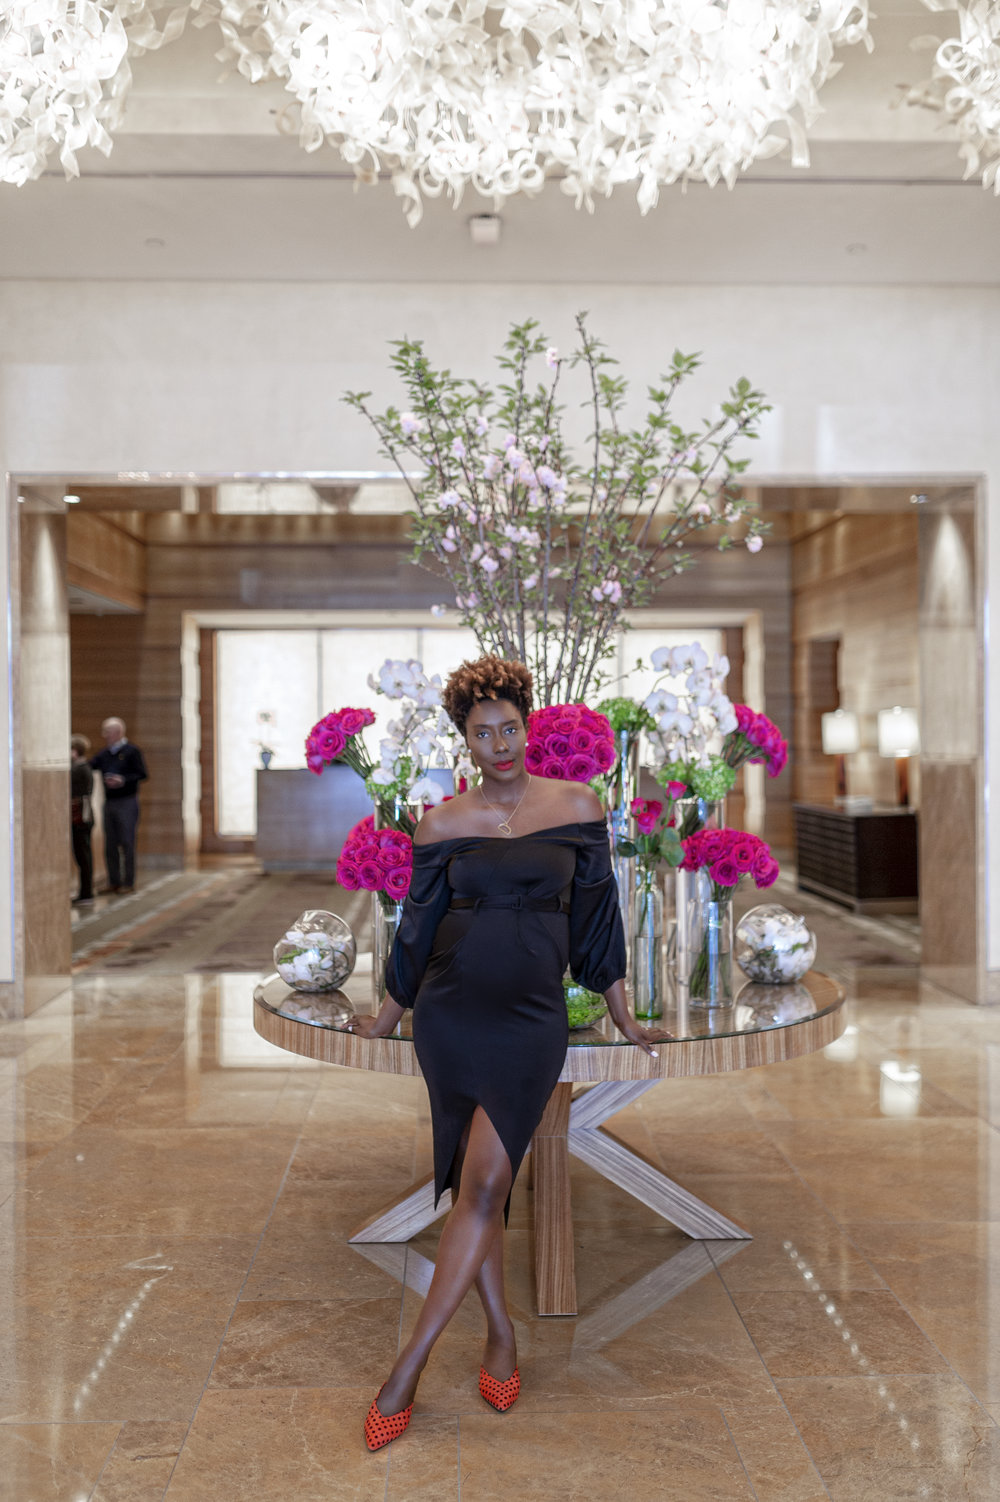 Dayna-bolden-baltimore-four-seasons-lobby.jpg